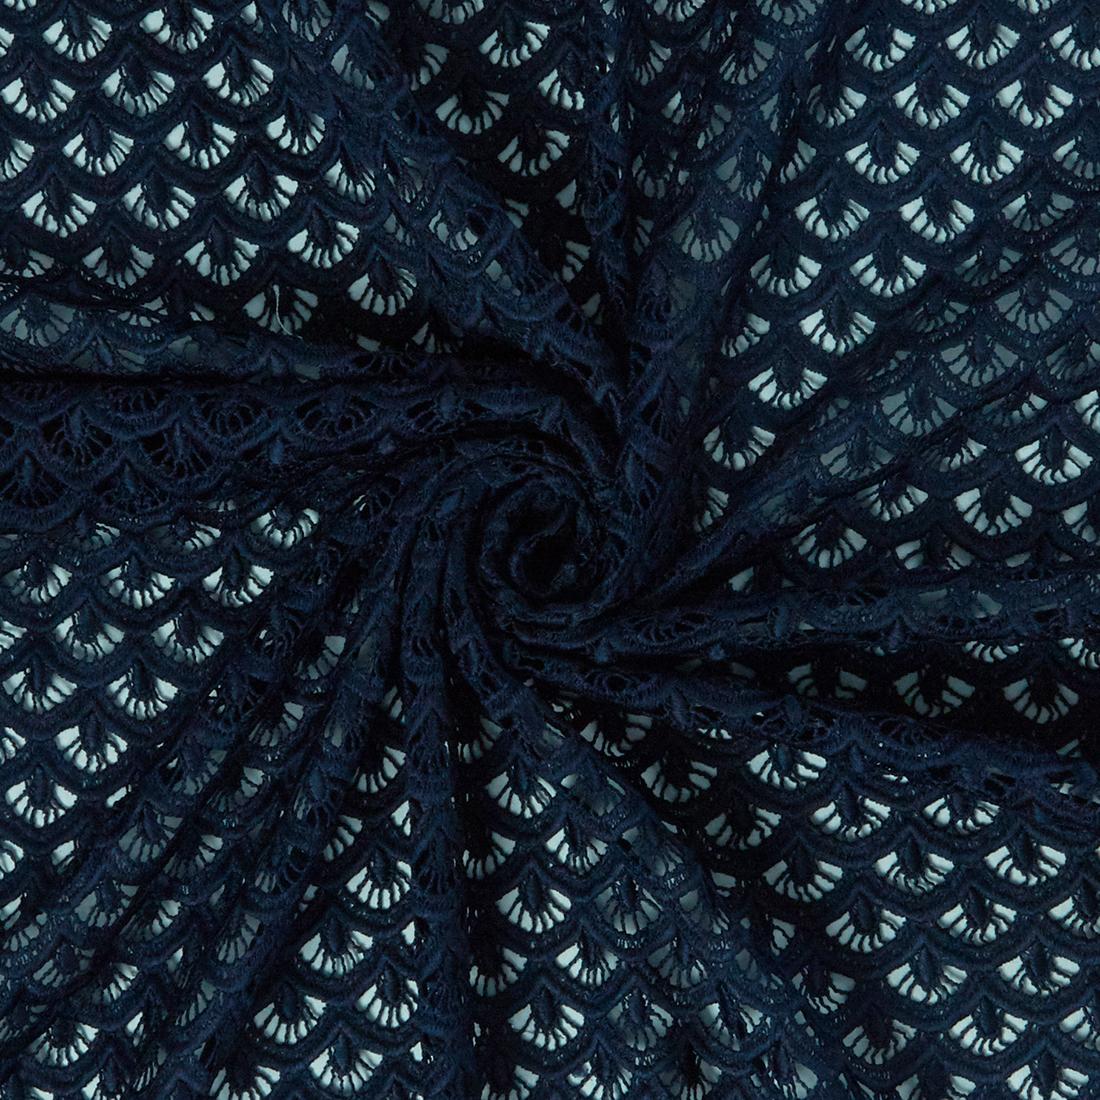 Mantilla Scallop Lace Navy Dress Fabric